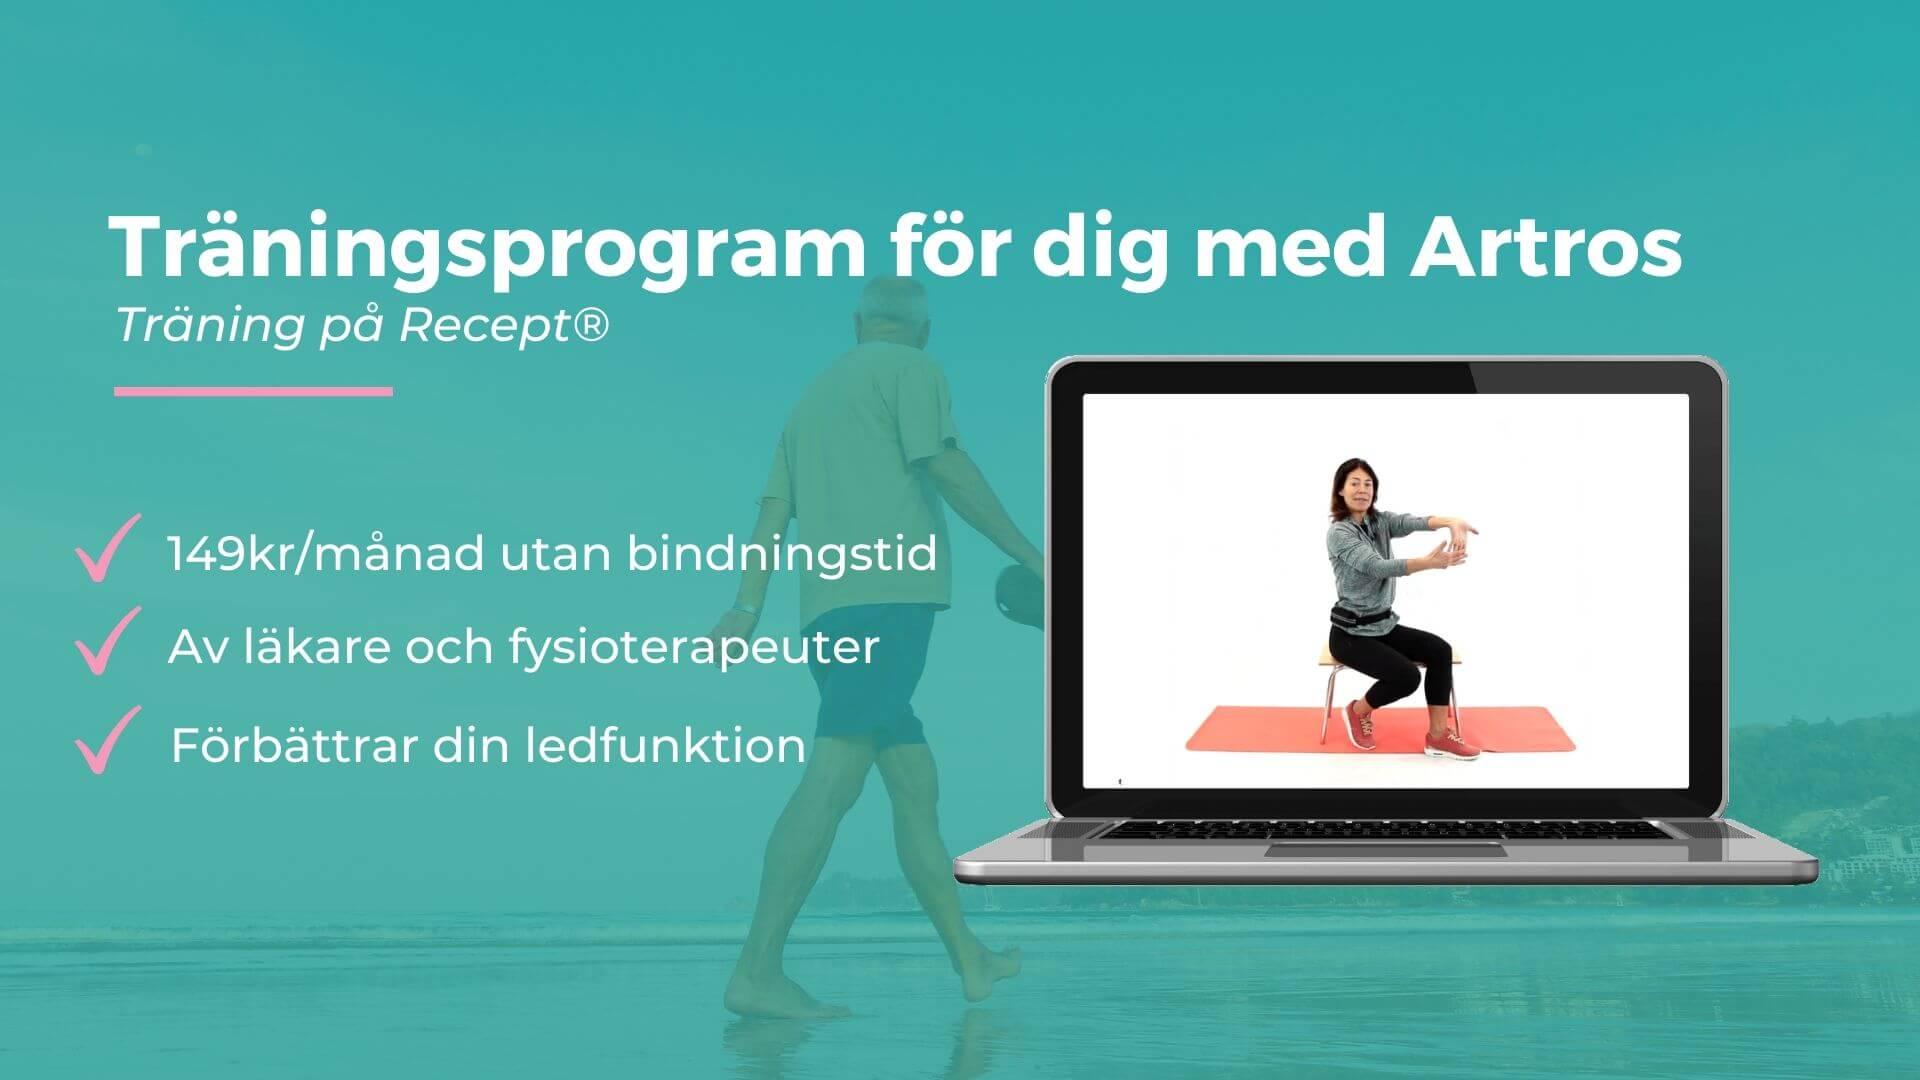 Artrosprogram